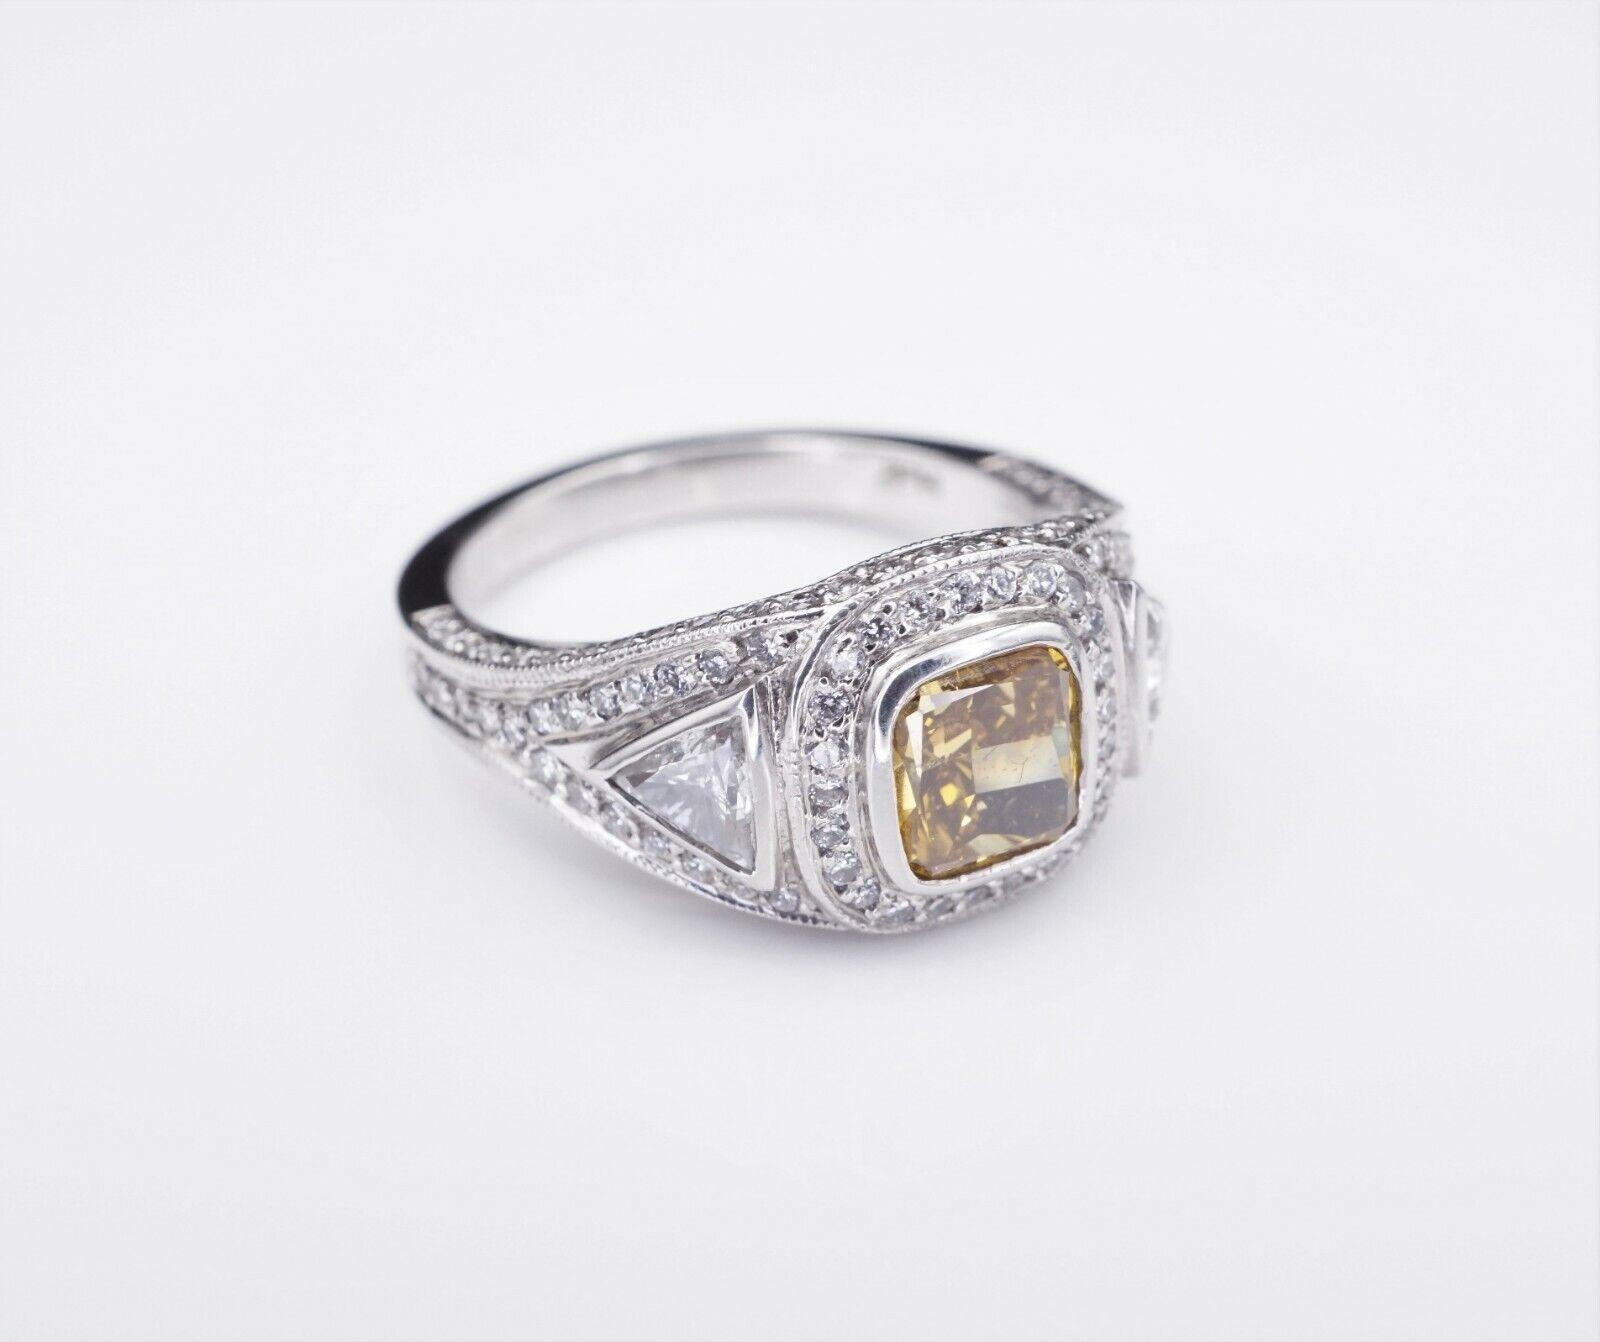 Platinum 3ct Orange-Yellow Diamond Halo Engagement Ring Size 6.75 GIA CO450 3